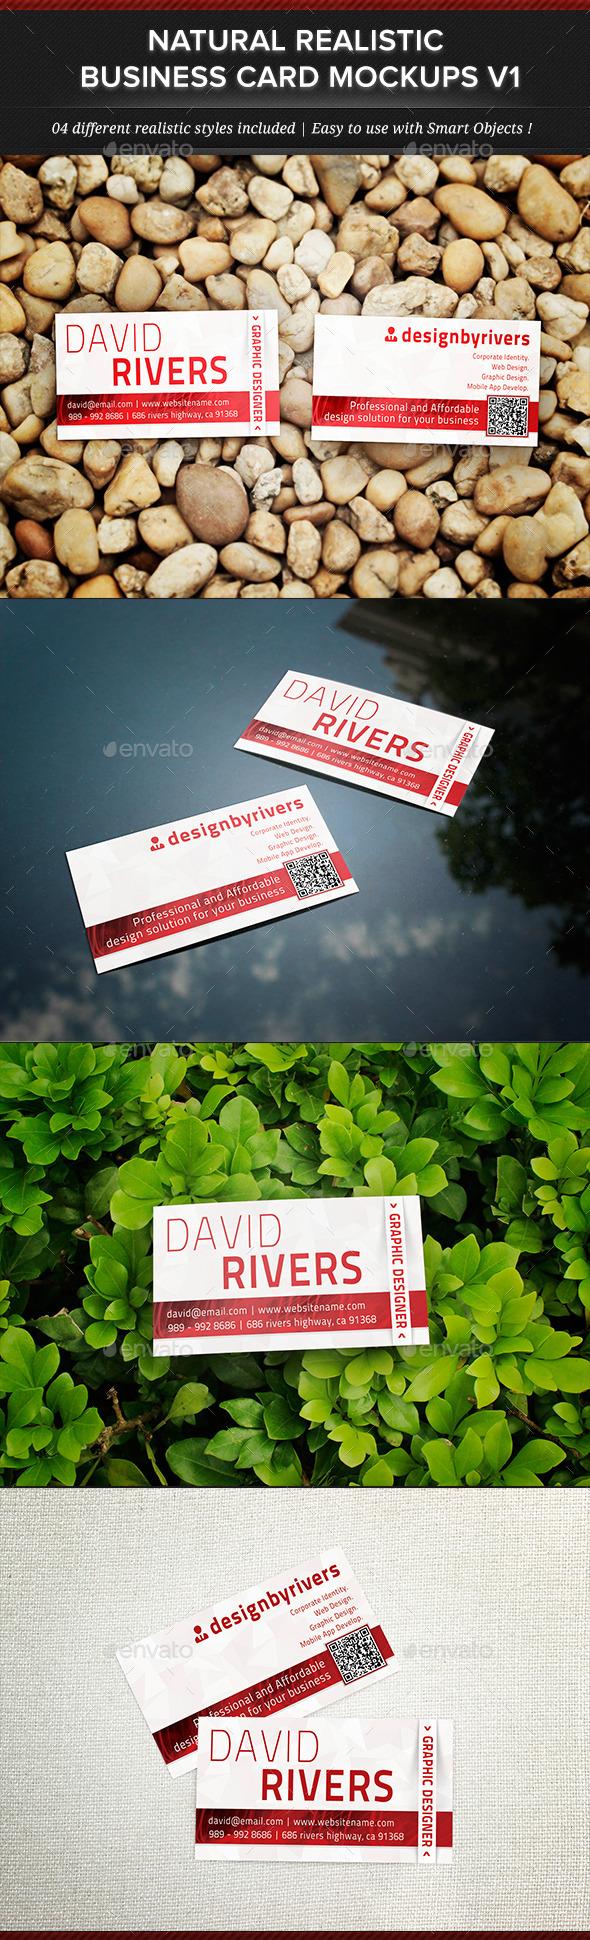 Natural Realistic Business Card Mockup V1 - Business Cards Print